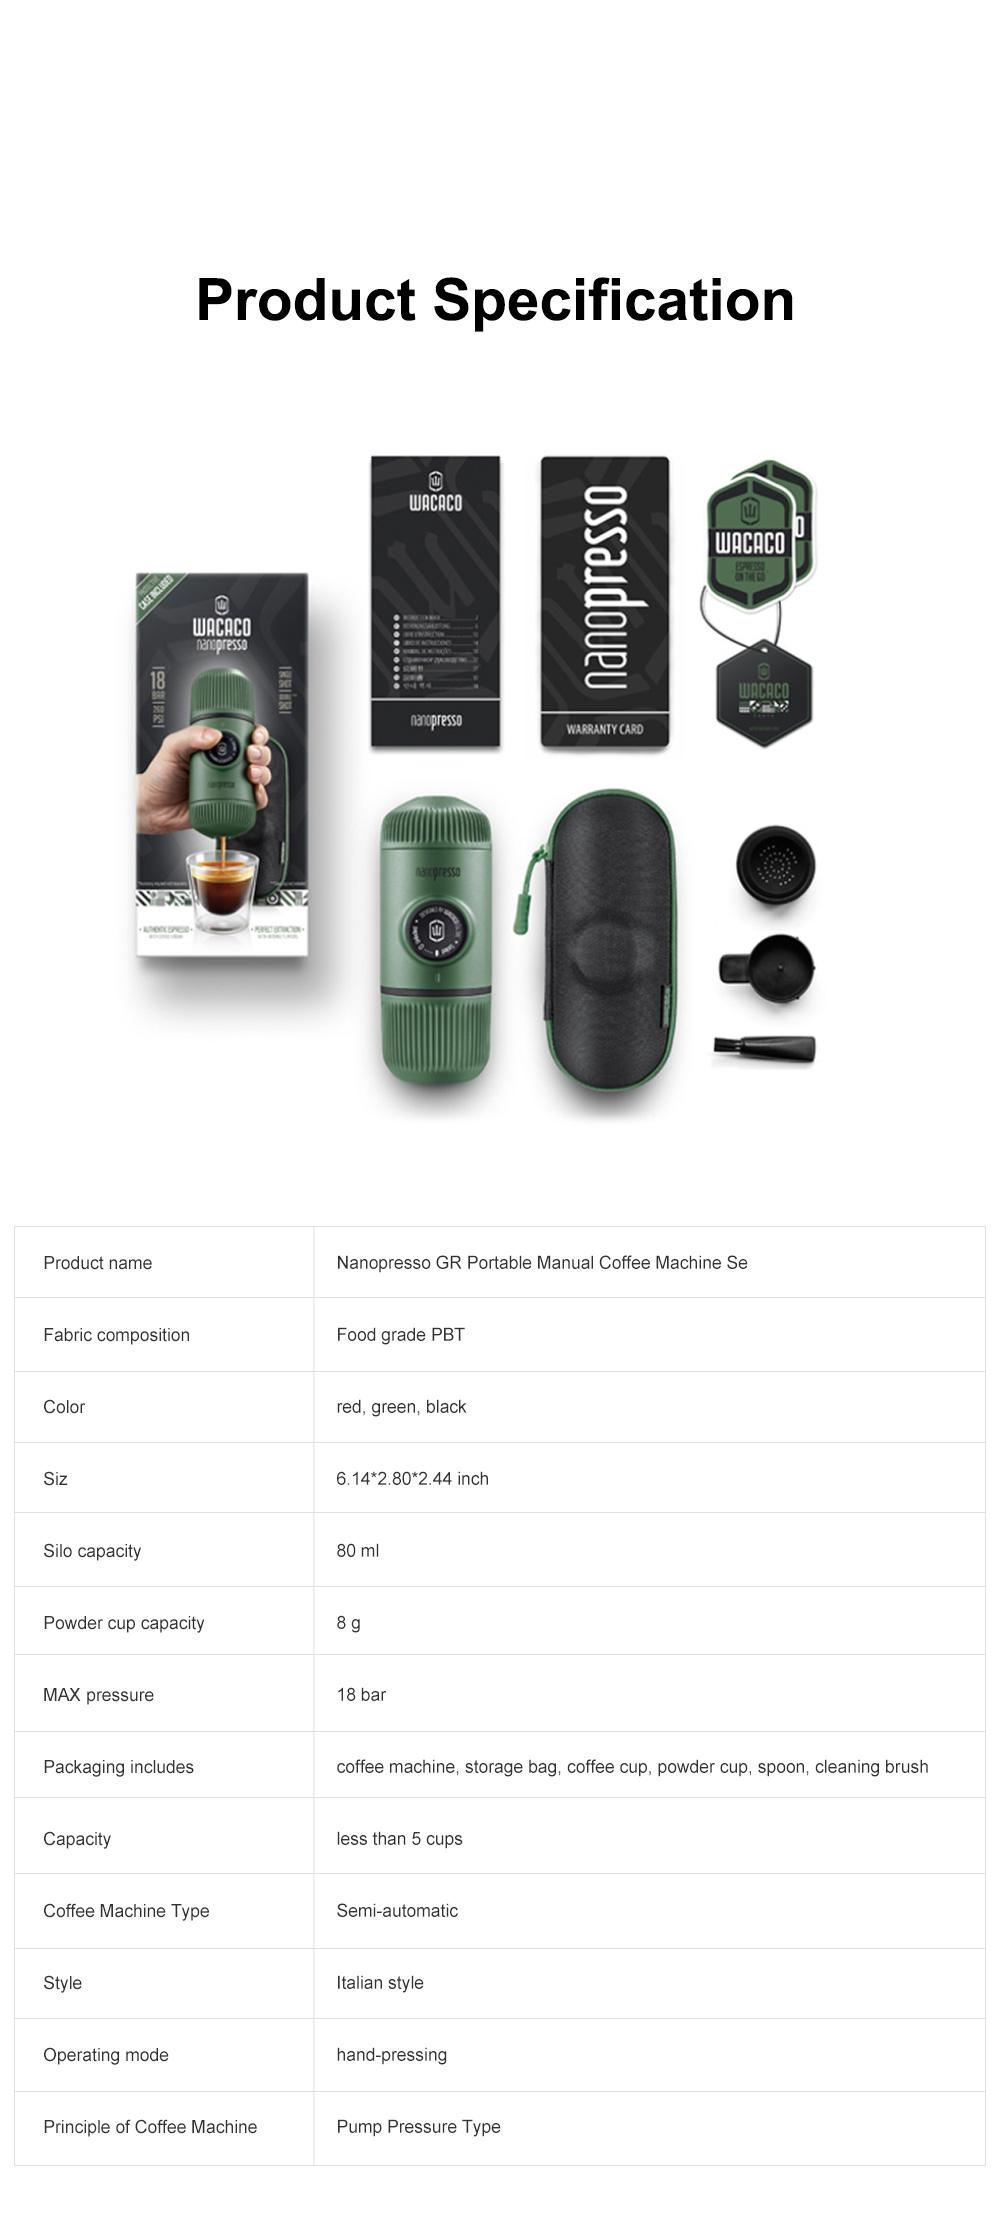 Nanopresso GR Portable Manual Coffee Machine Set Outdoor Dual-purpose Manual Espresso Machine 7